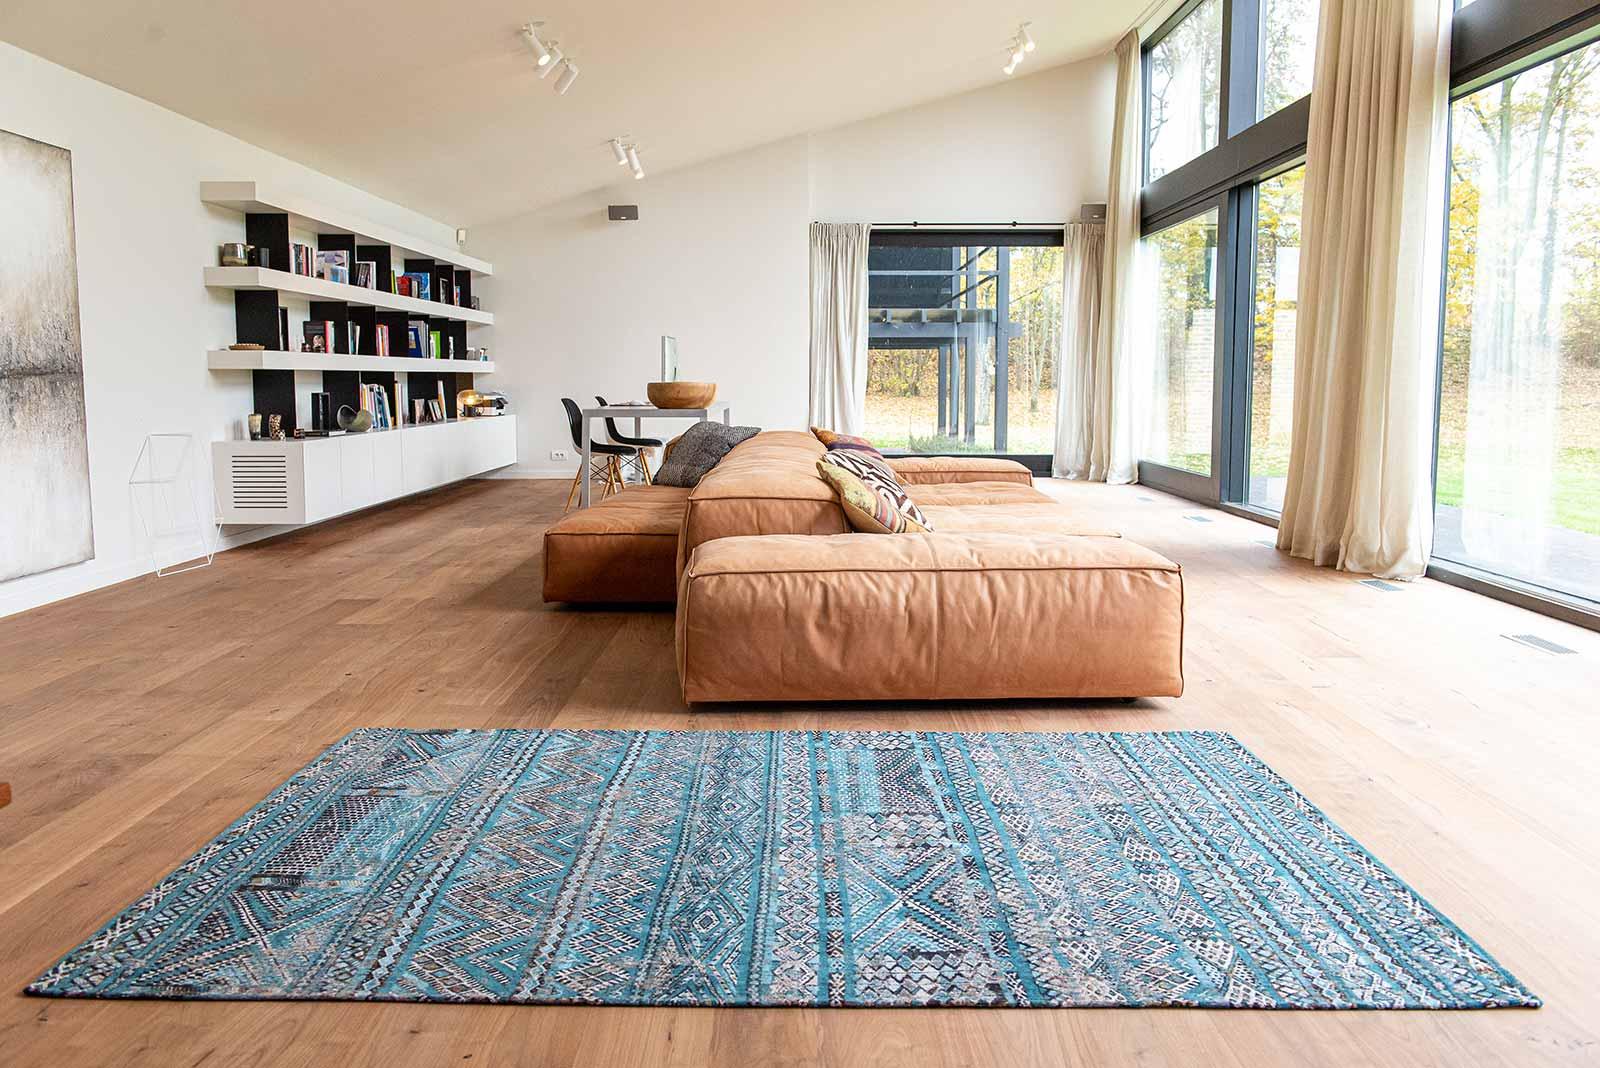 Louis De Poortere teppich LX 9110 Antiquarian Kilim Zemmuri Blue interior 2